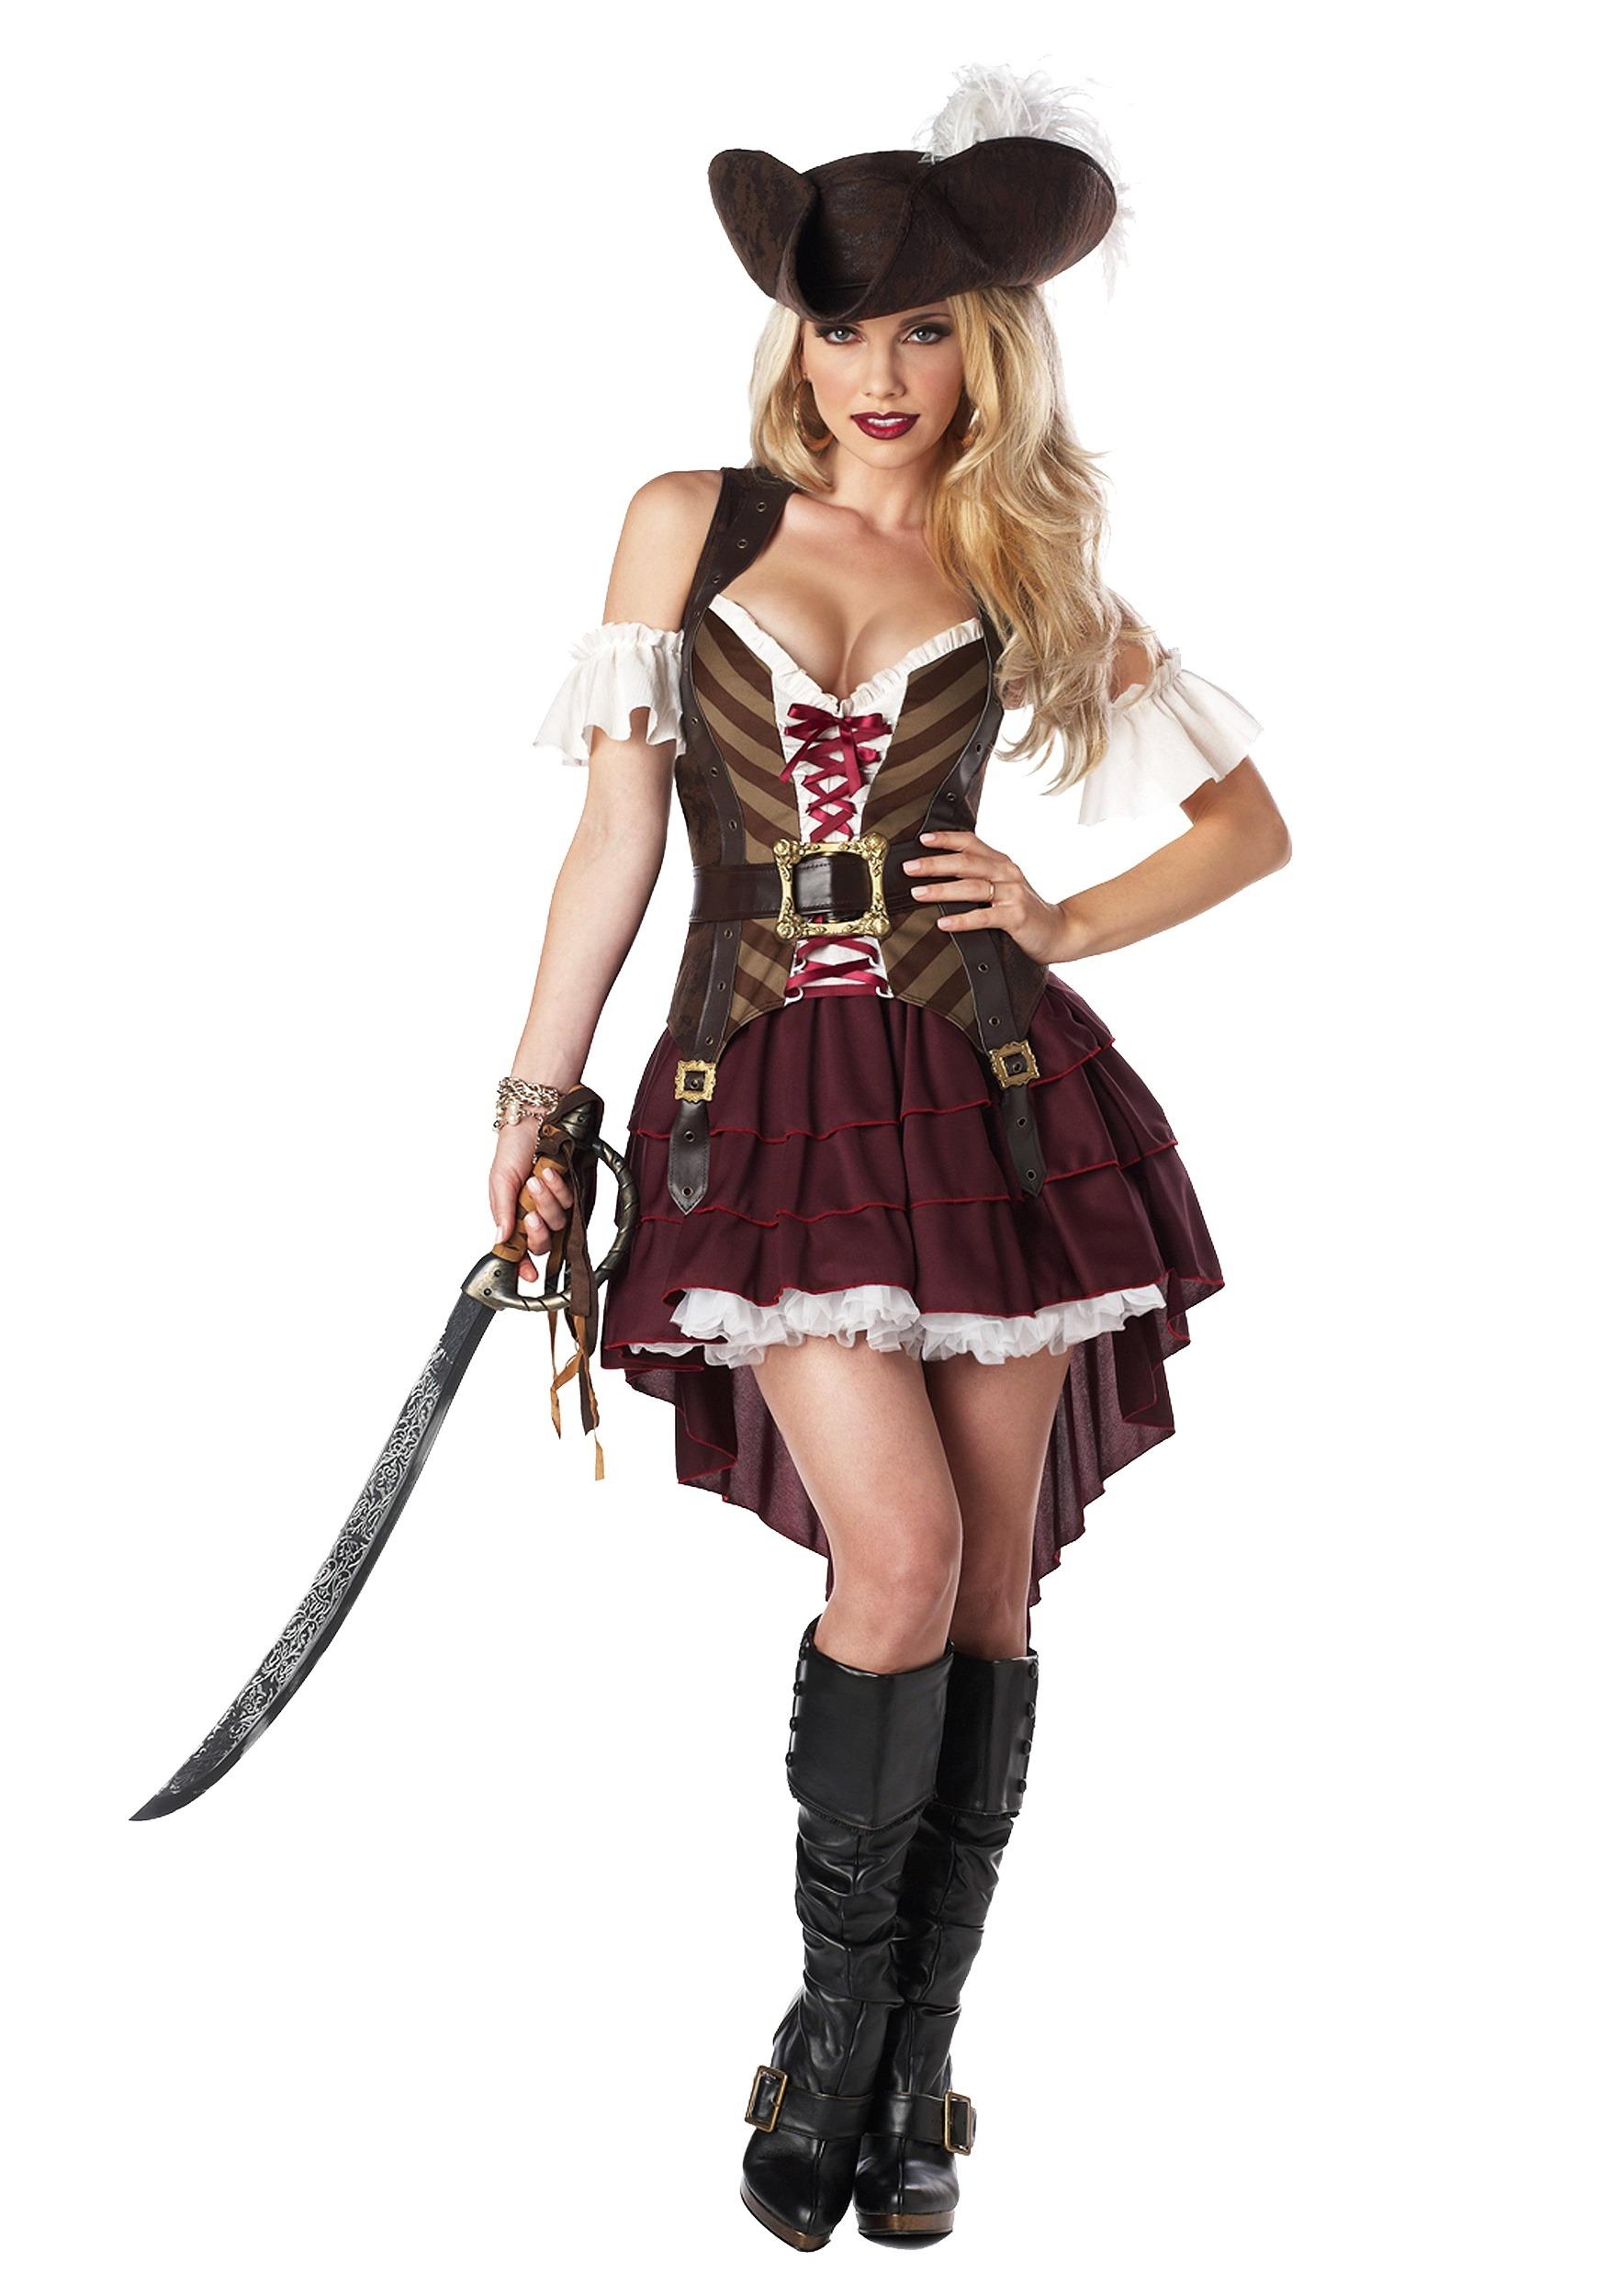 Sexy Swashbuckler Captain Women's Costume | Womens Sexy Pirate Costume